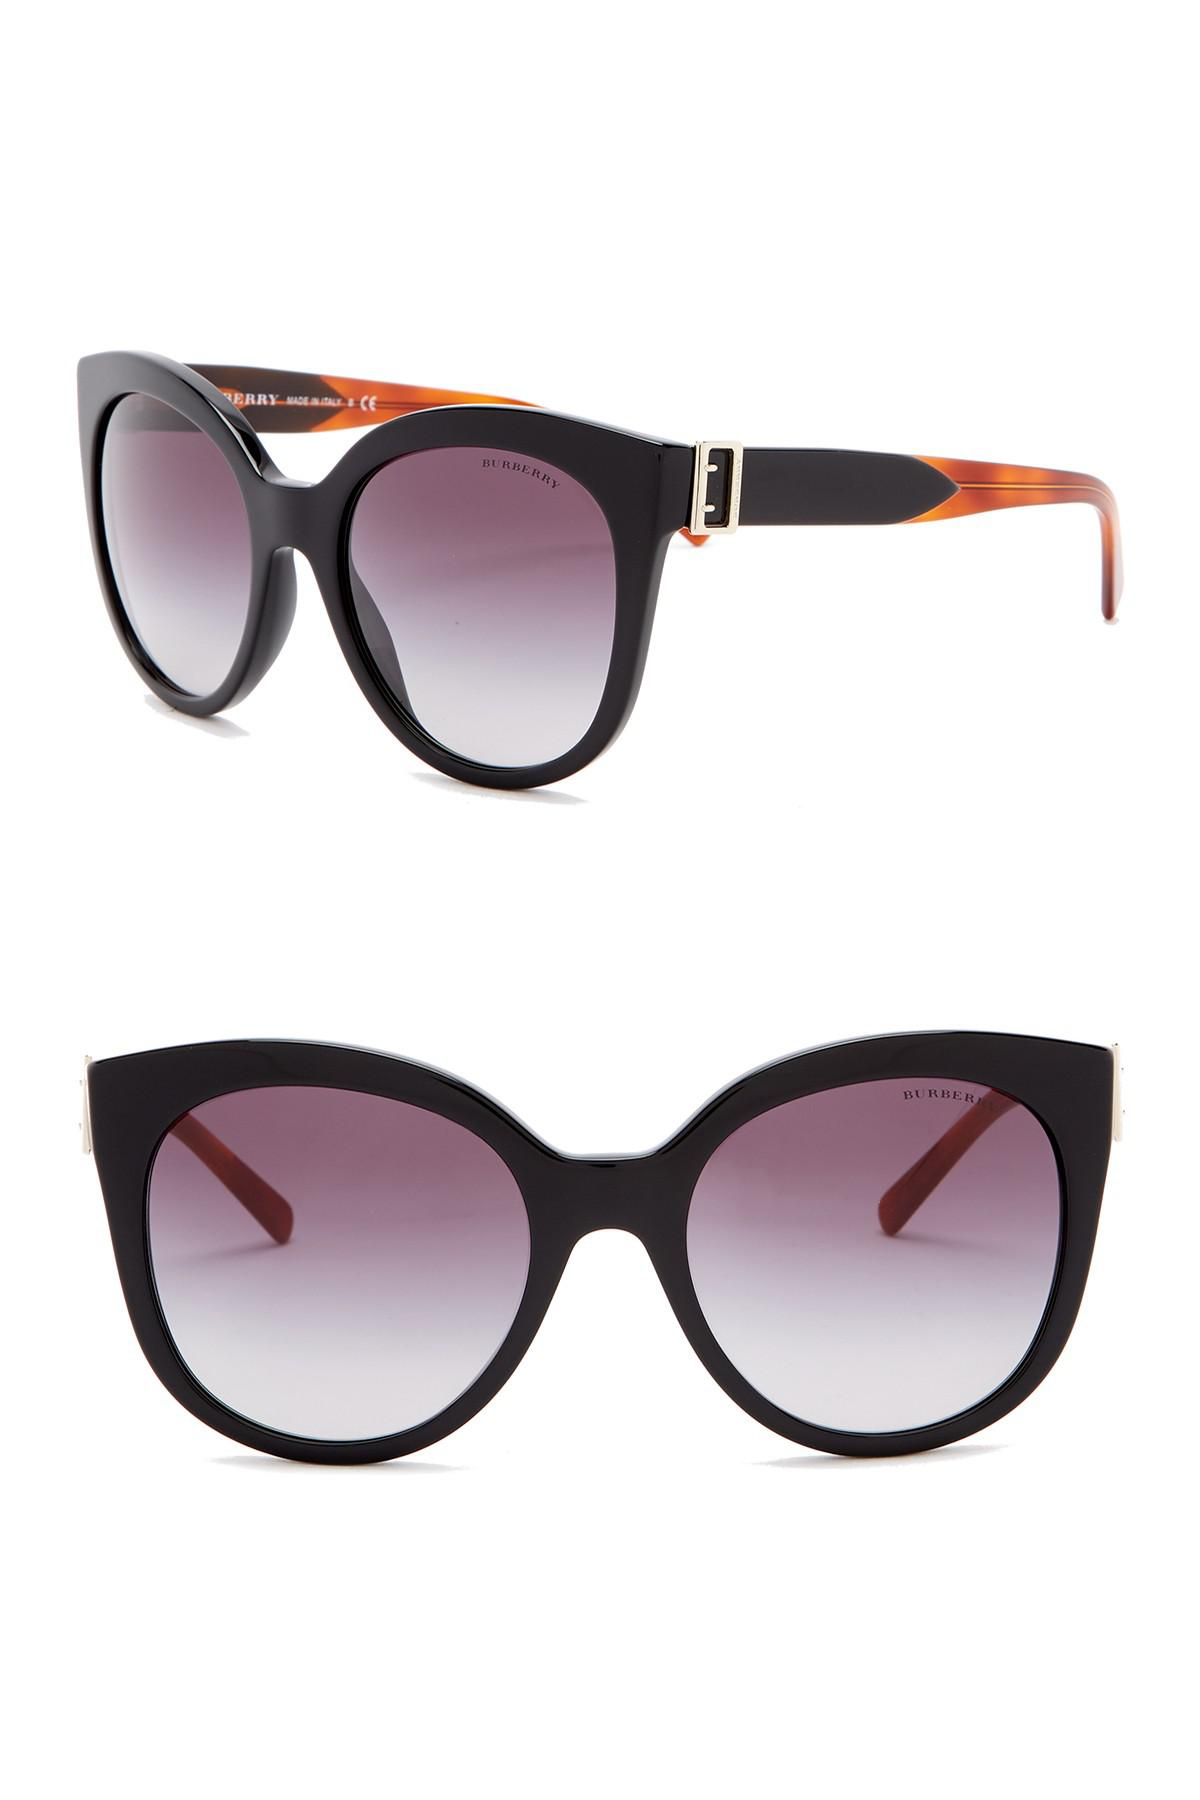 7feb5c2e948 Burberry - Black 55mm Cat Eye Sunglasses - Lyst. View fullscreen